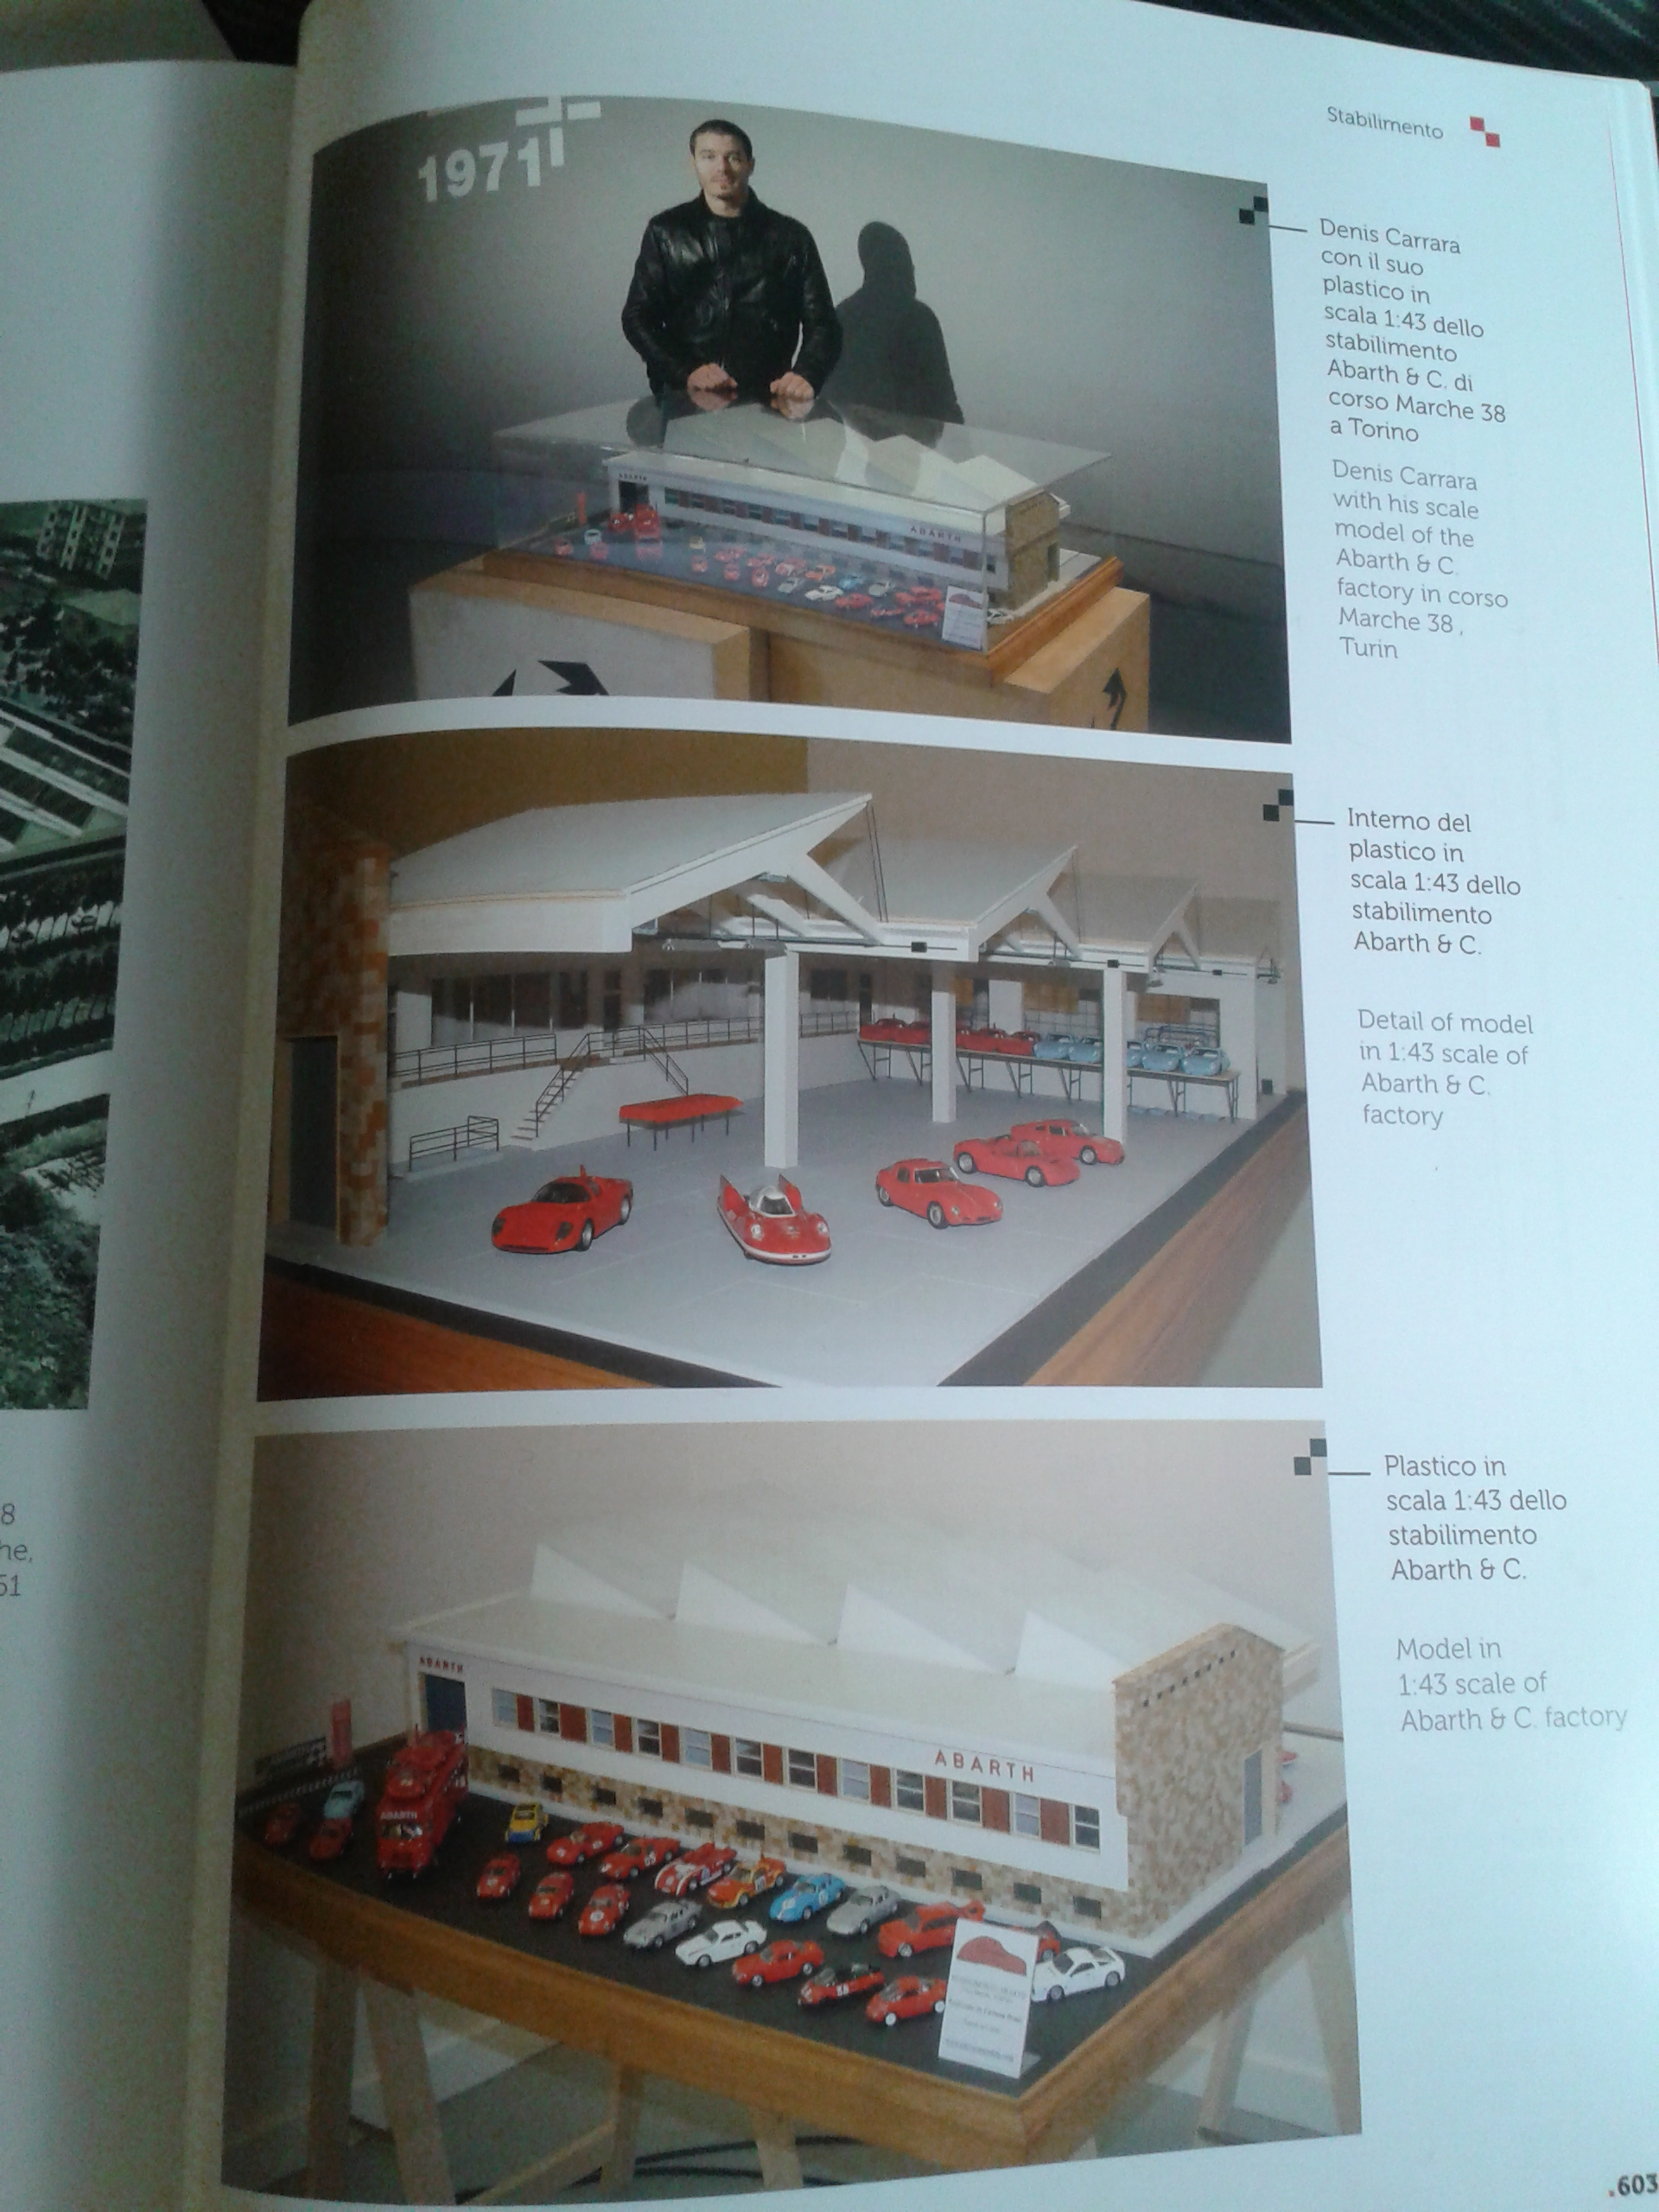 Diorama Stabilimento Abarth in scala 1:43 by Carrara Models